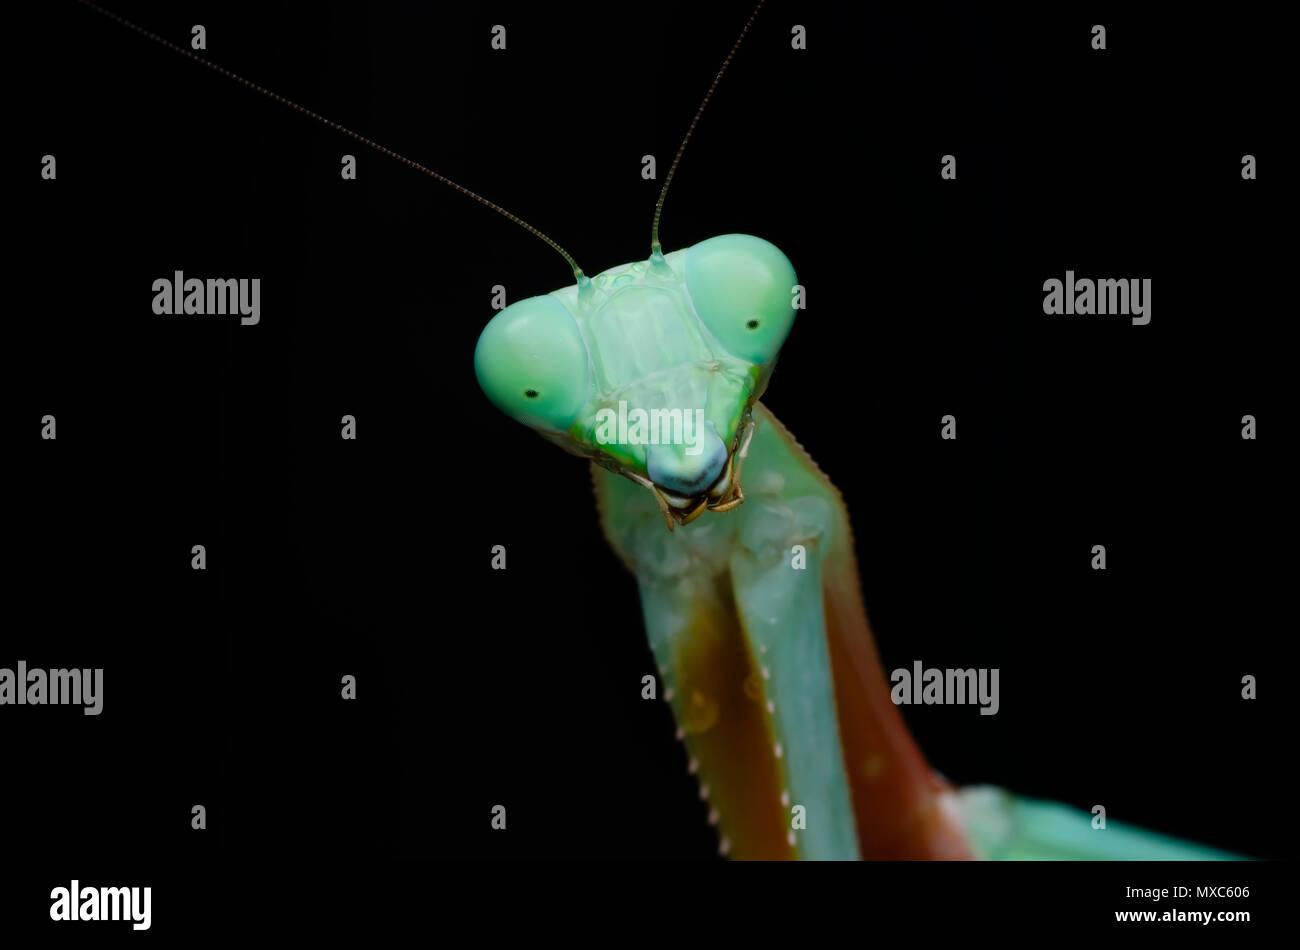 Grüne Gottesanbeterin. Hierodula s.p Stockfoto